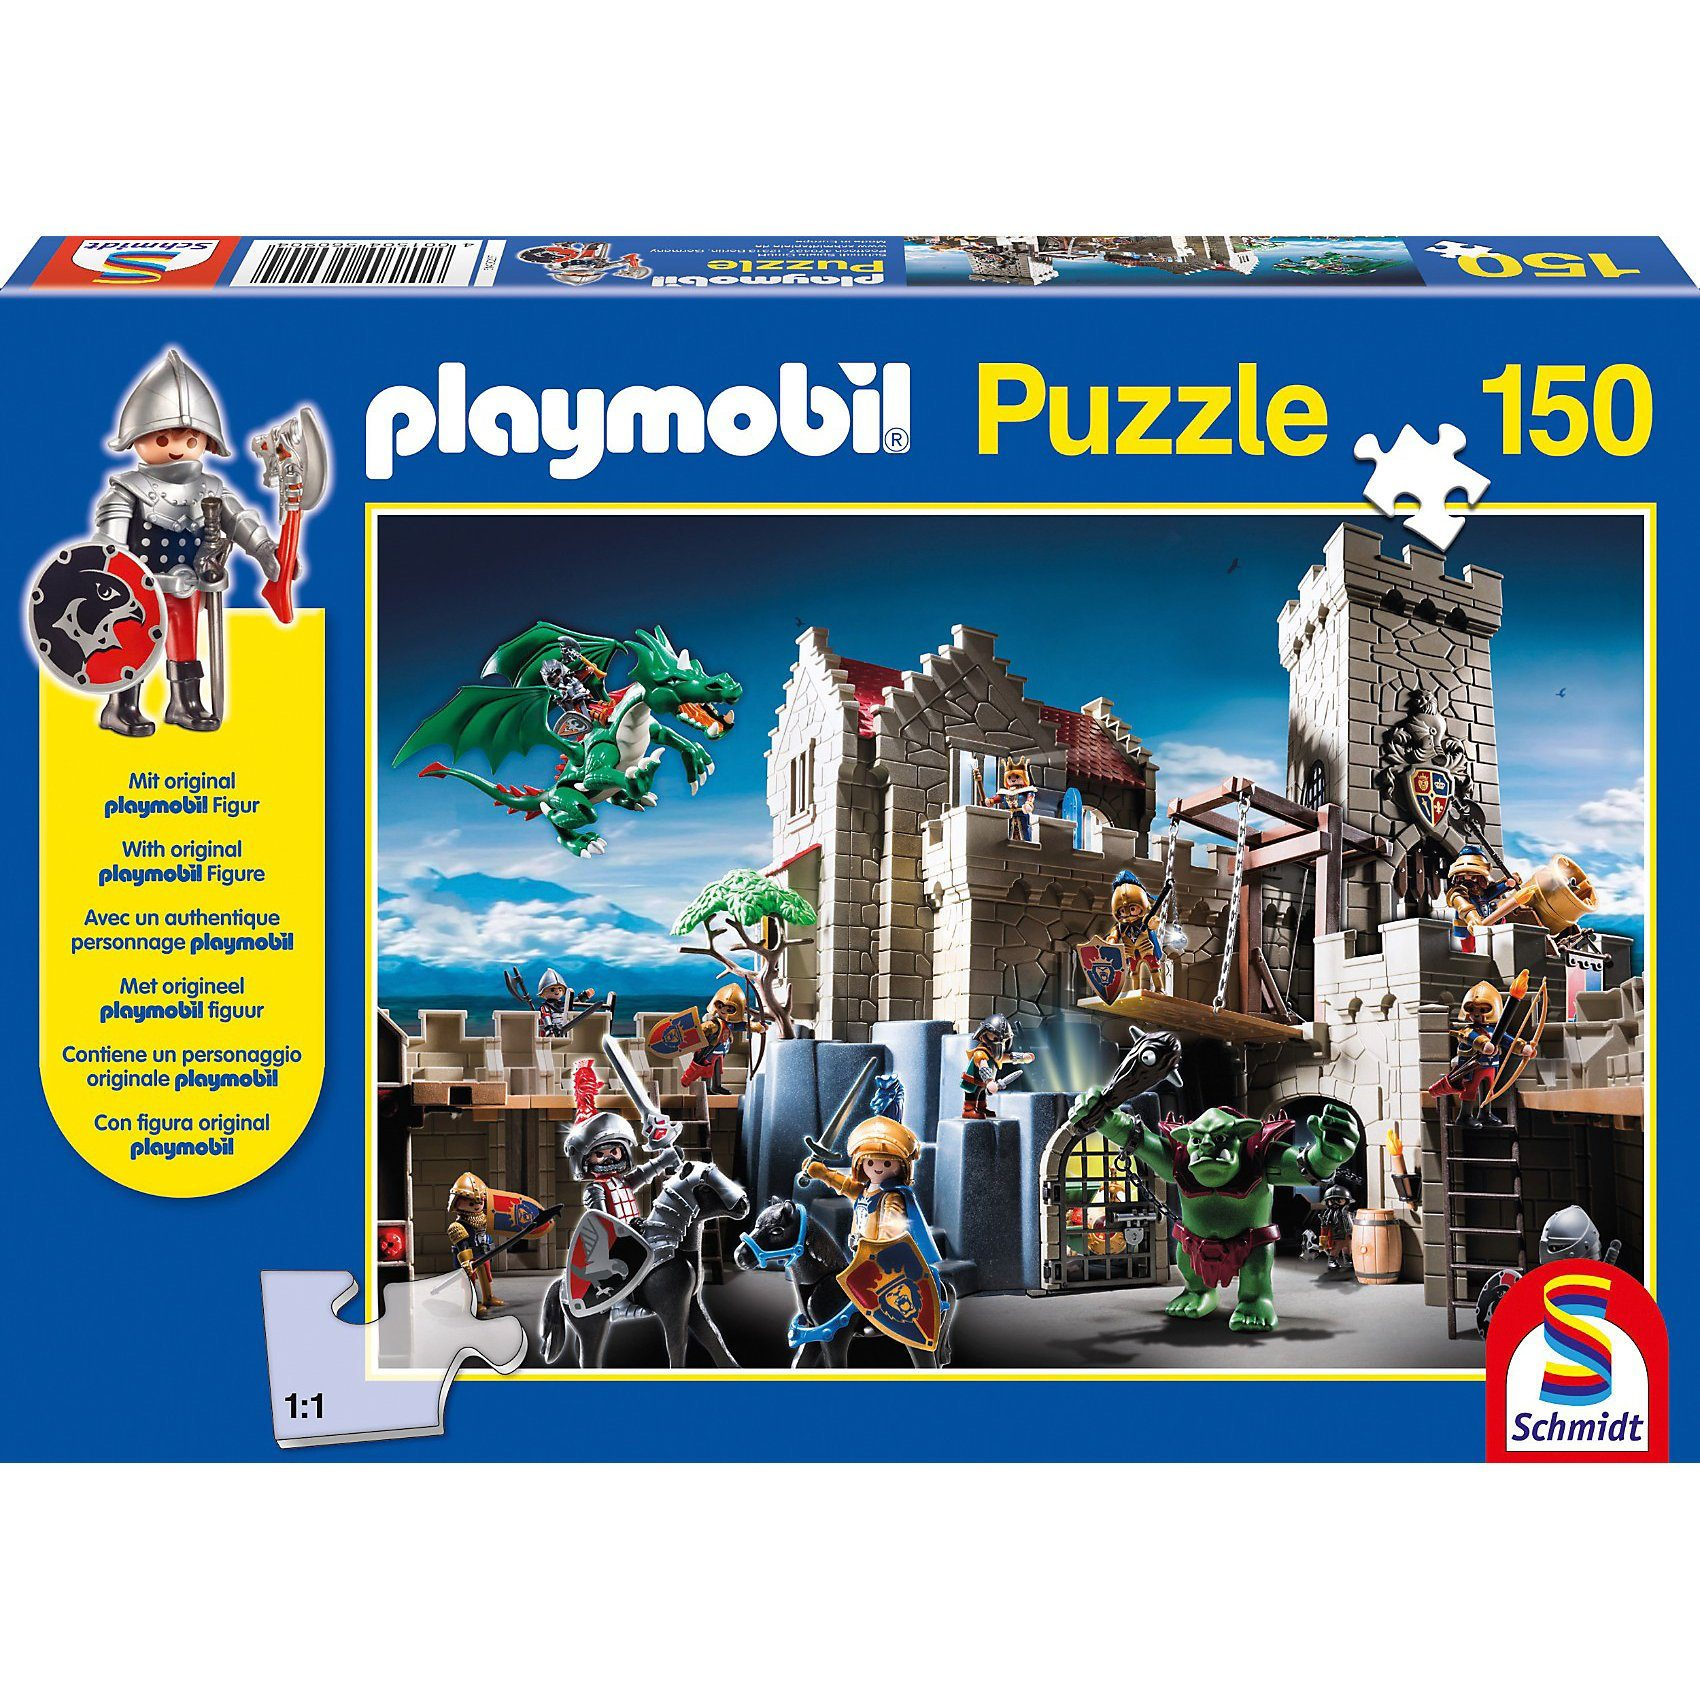 Schmidt Spiele Playmobil, Kampf um den Königsschatz, 150 Teile, mit Origina